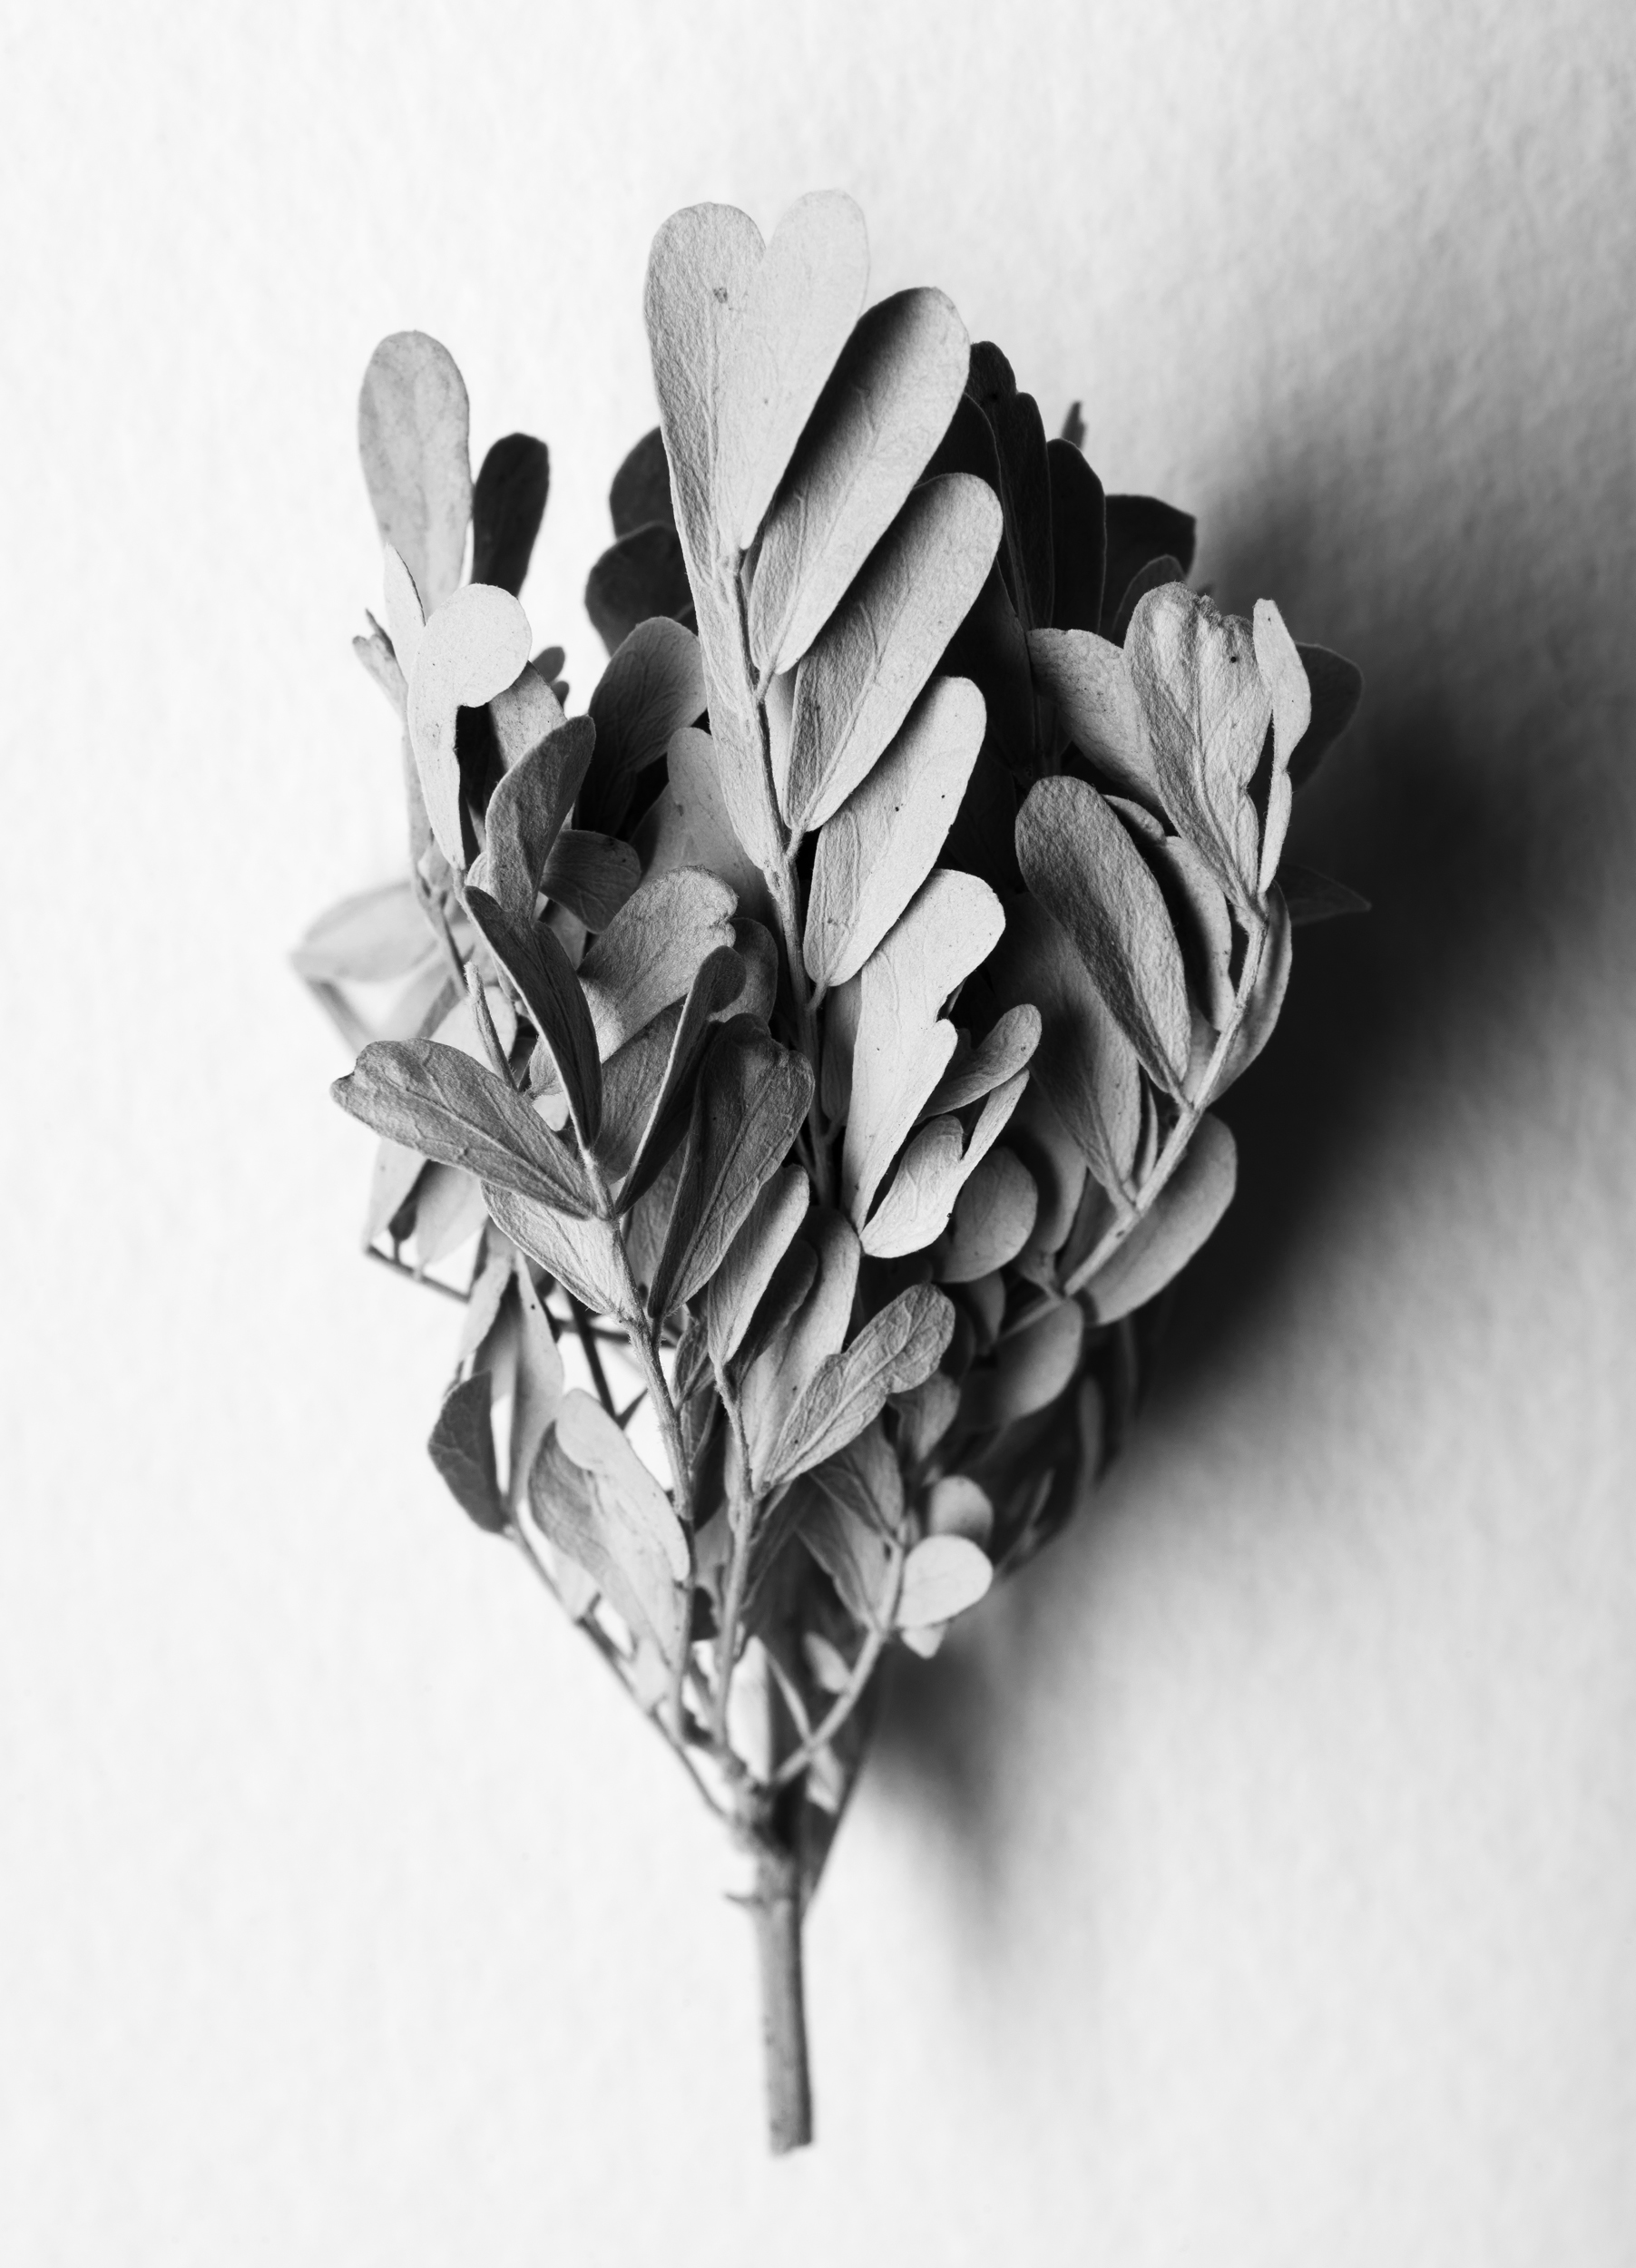 Ironwood leaf cluster, 2016